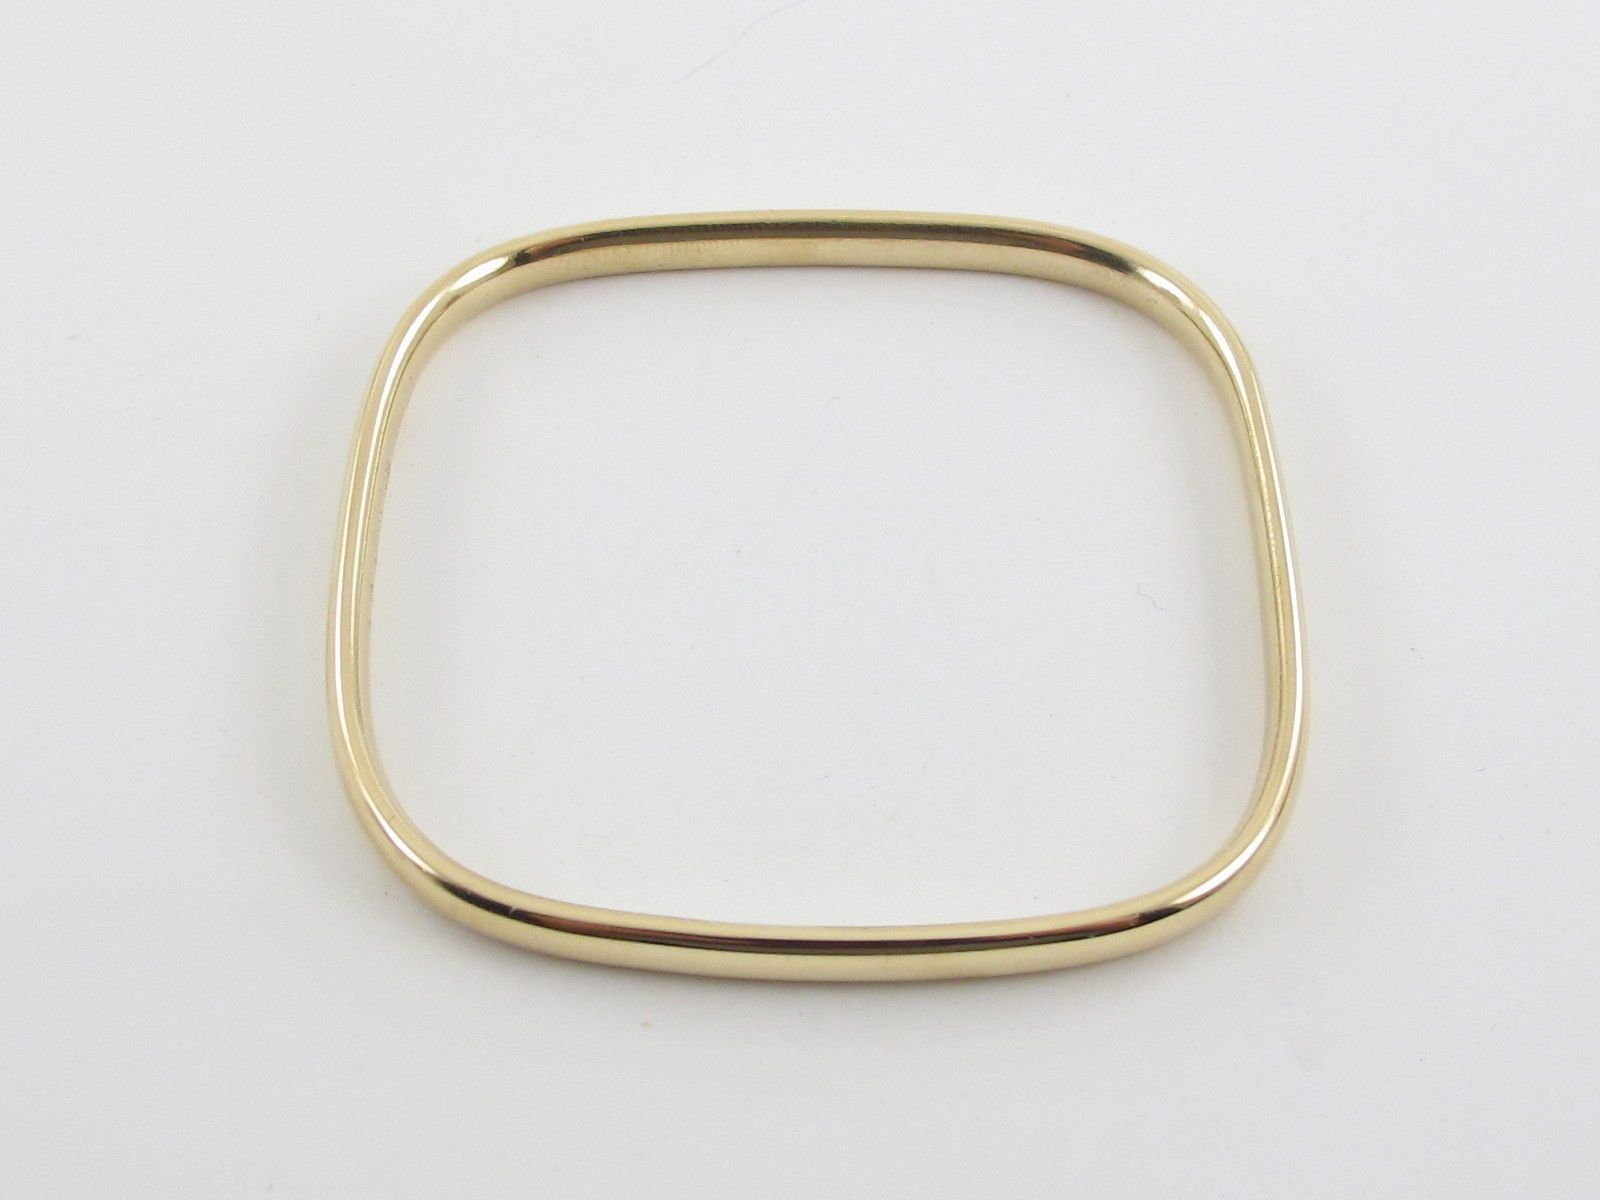 K yellow gold cartier bangle bracelet